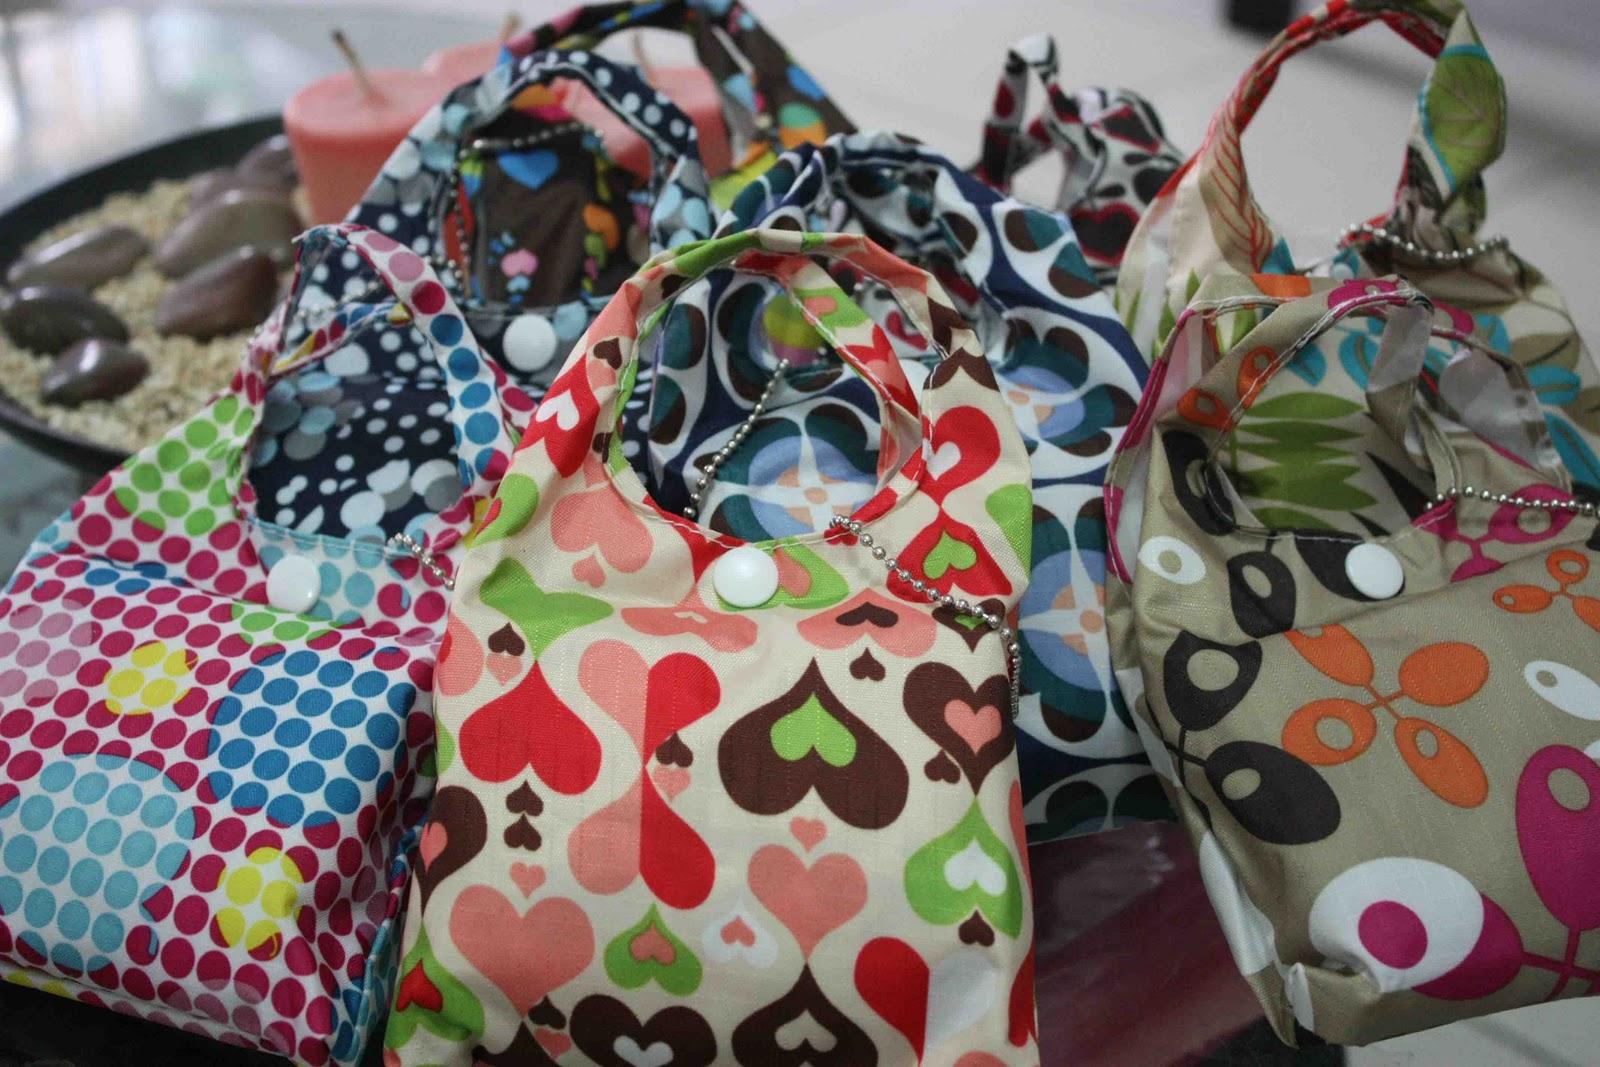 Thrifty Finds at Baclaran and Coastal Mall